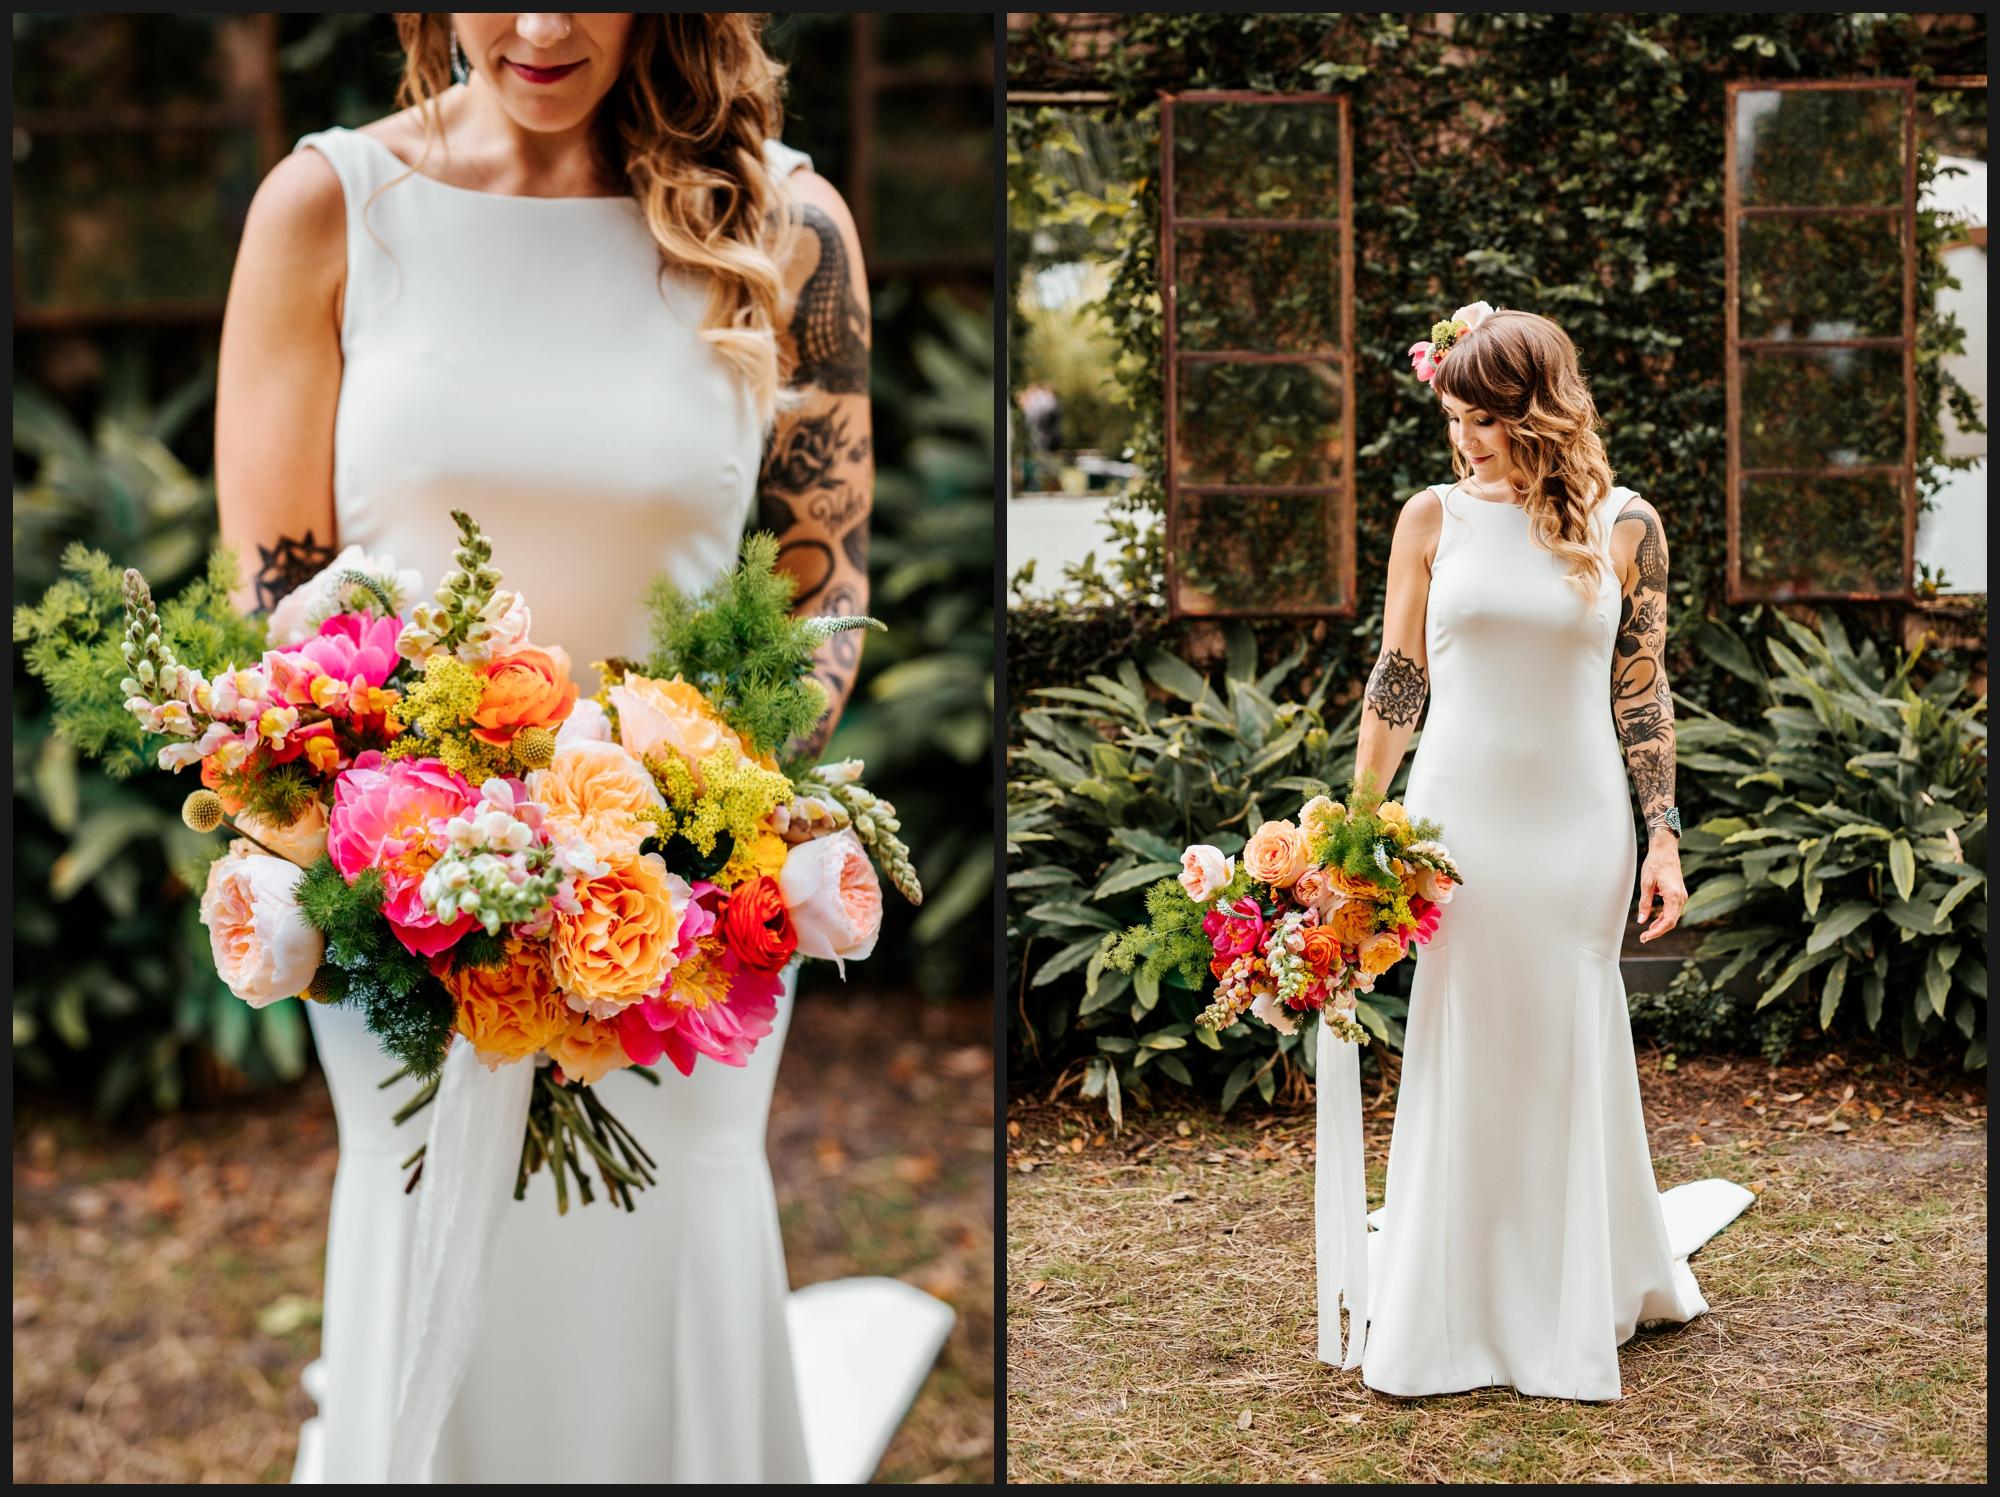 Orlando-Wedding-Photographer-destination-wedding-photographer-florida-wedding-photographer-bohemian-wedding-photographer_1945.jpg